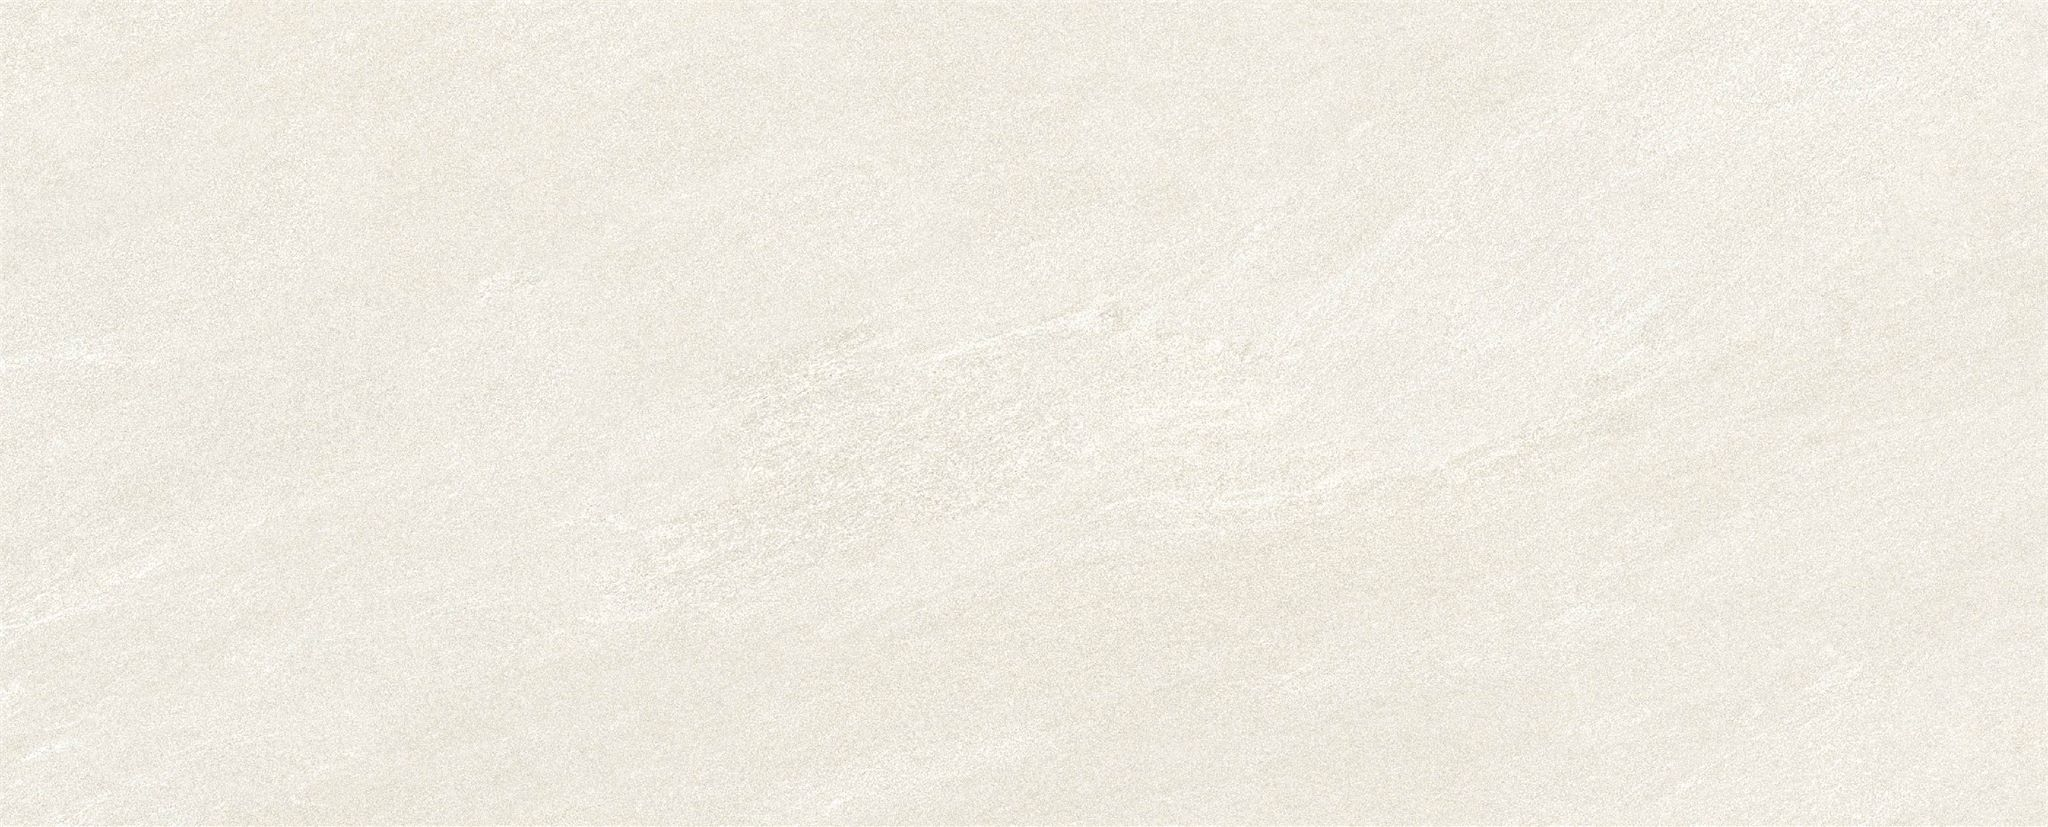 Настенная плитка Mayolica Avalon Crema 28х70 настенная плитка petracer s grand elegance giglio blu su crema 20x20